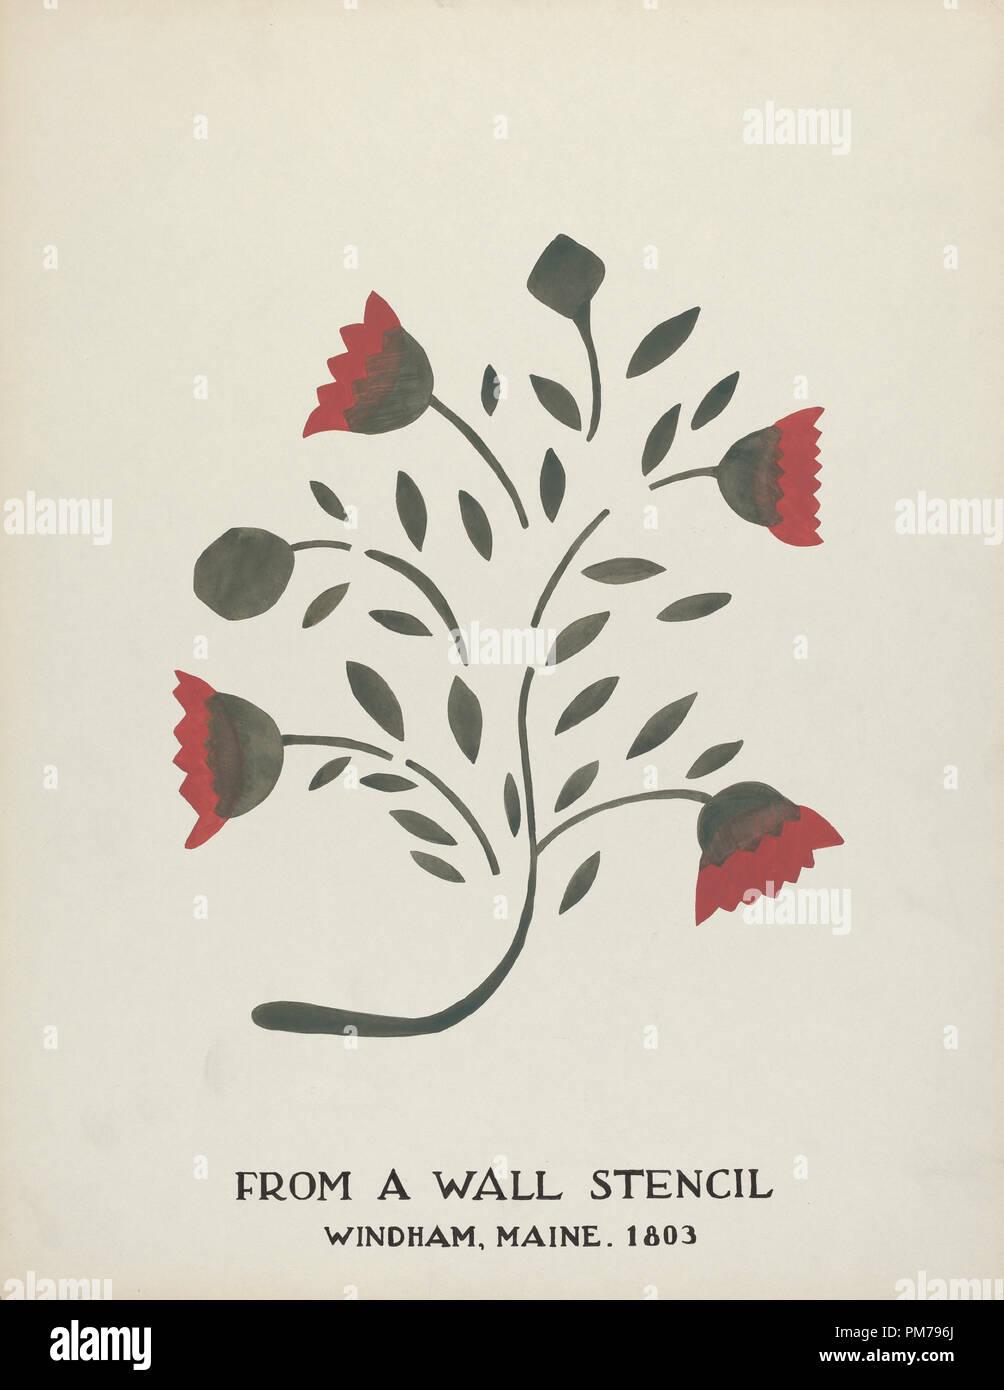 Design from Windham, Maine 1803: From Proposed Portfolio